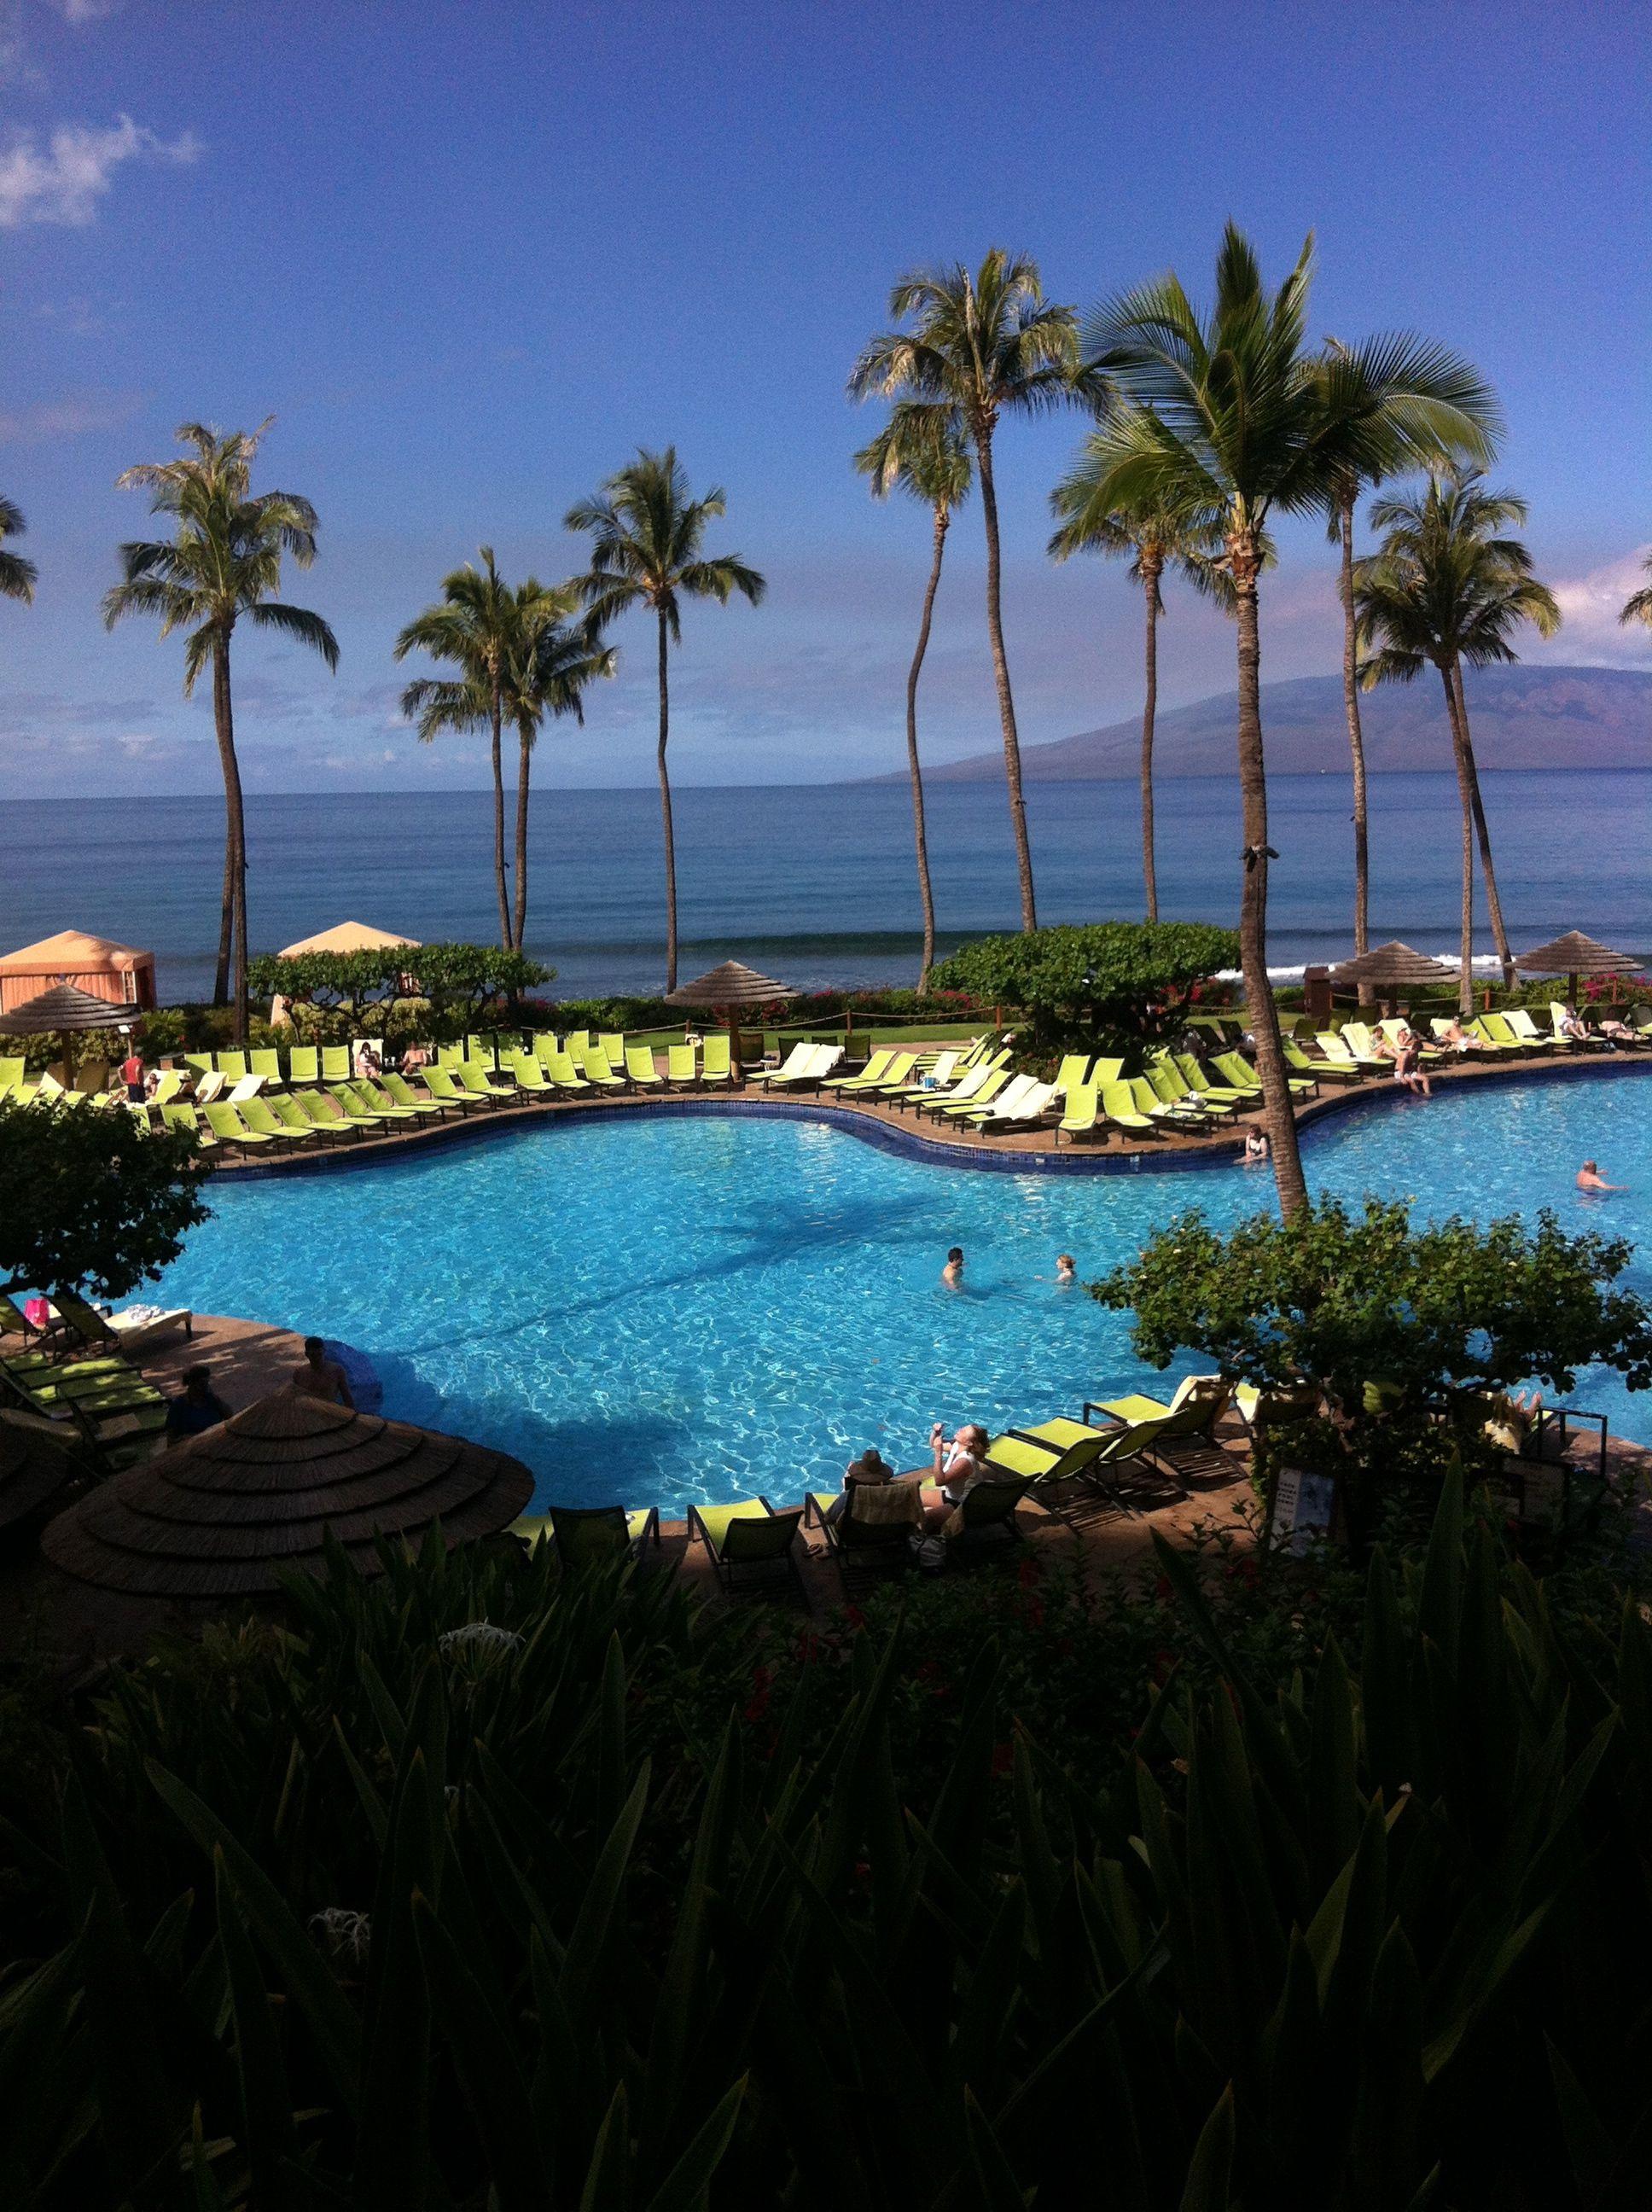 the beautiful hyatt regency maui, our host hotel for the 2013